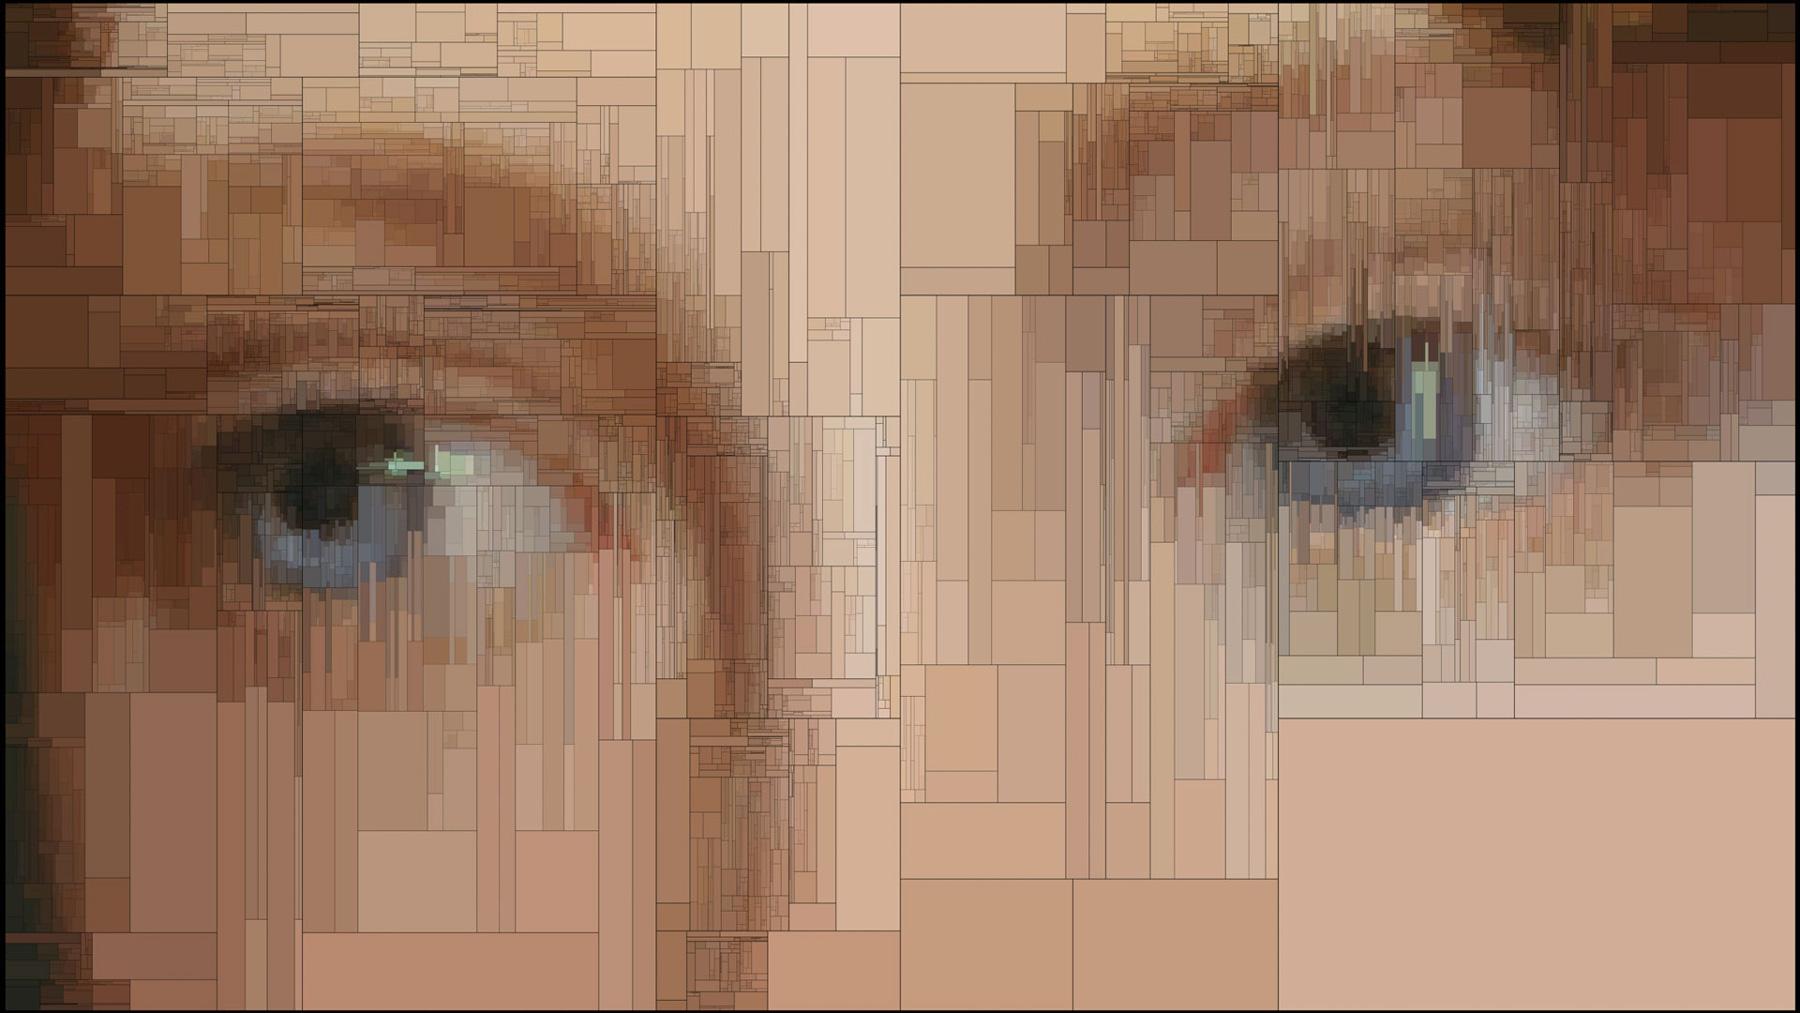 Digital Interpretations of Classical Paintings Using Algorithms